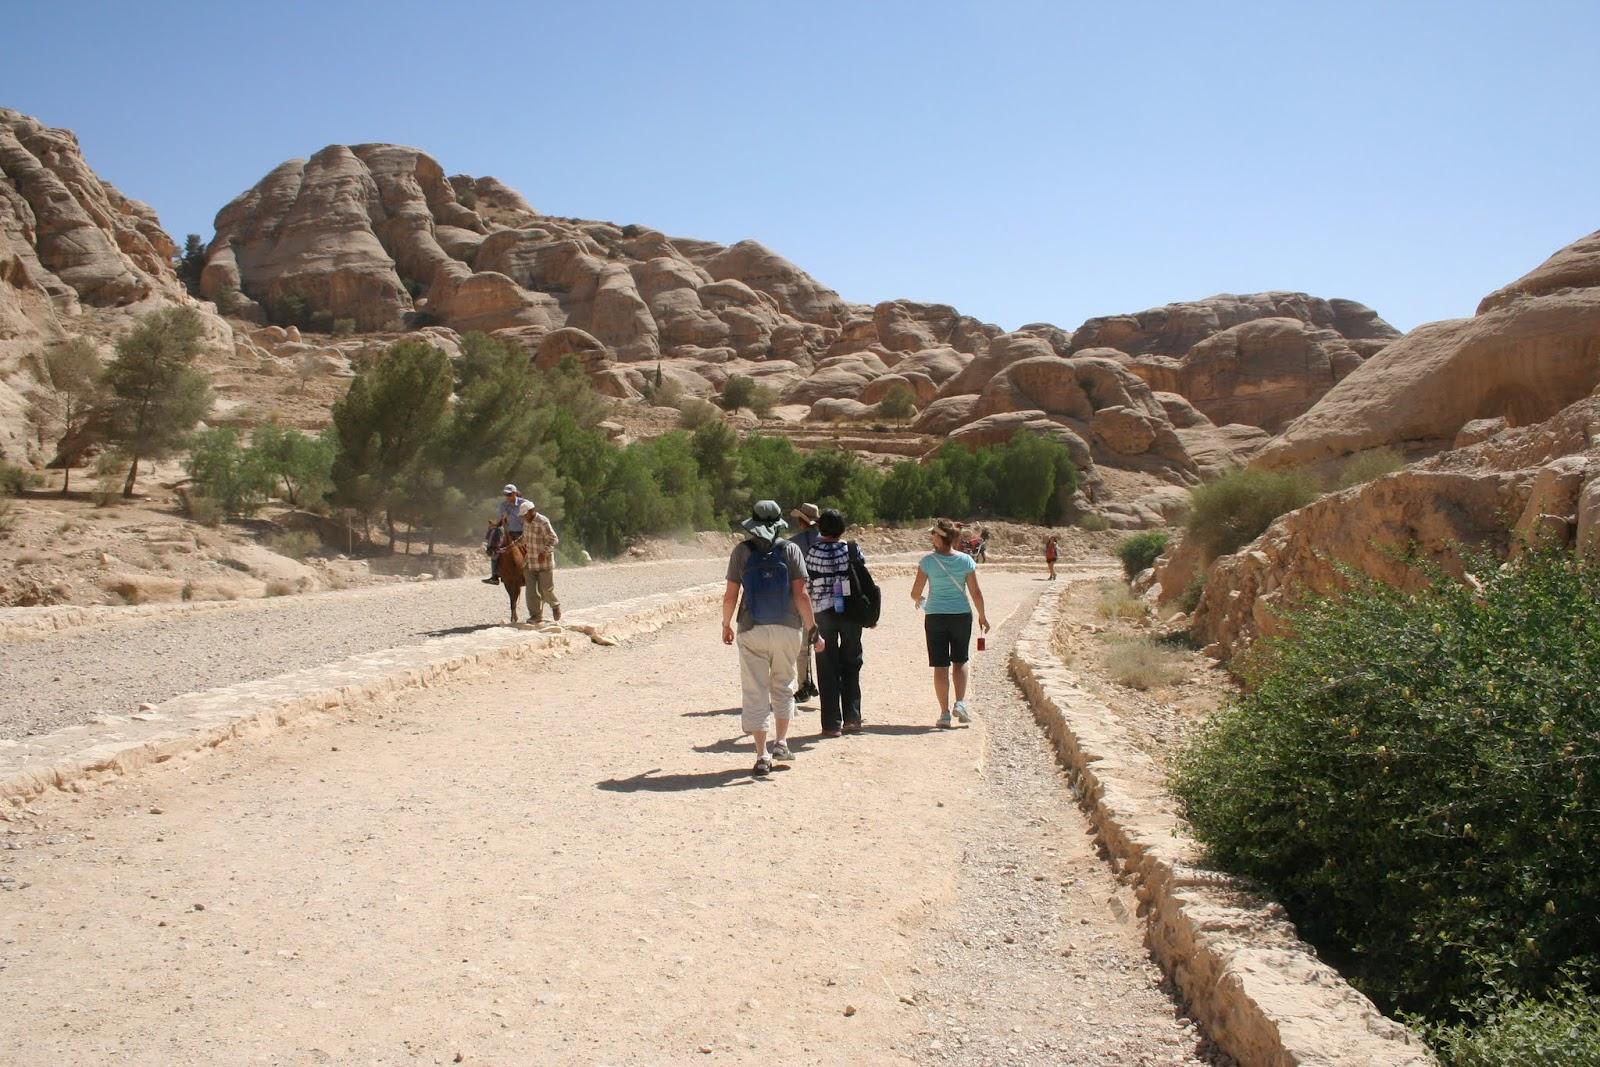 Walking toward the entrance to the Siq